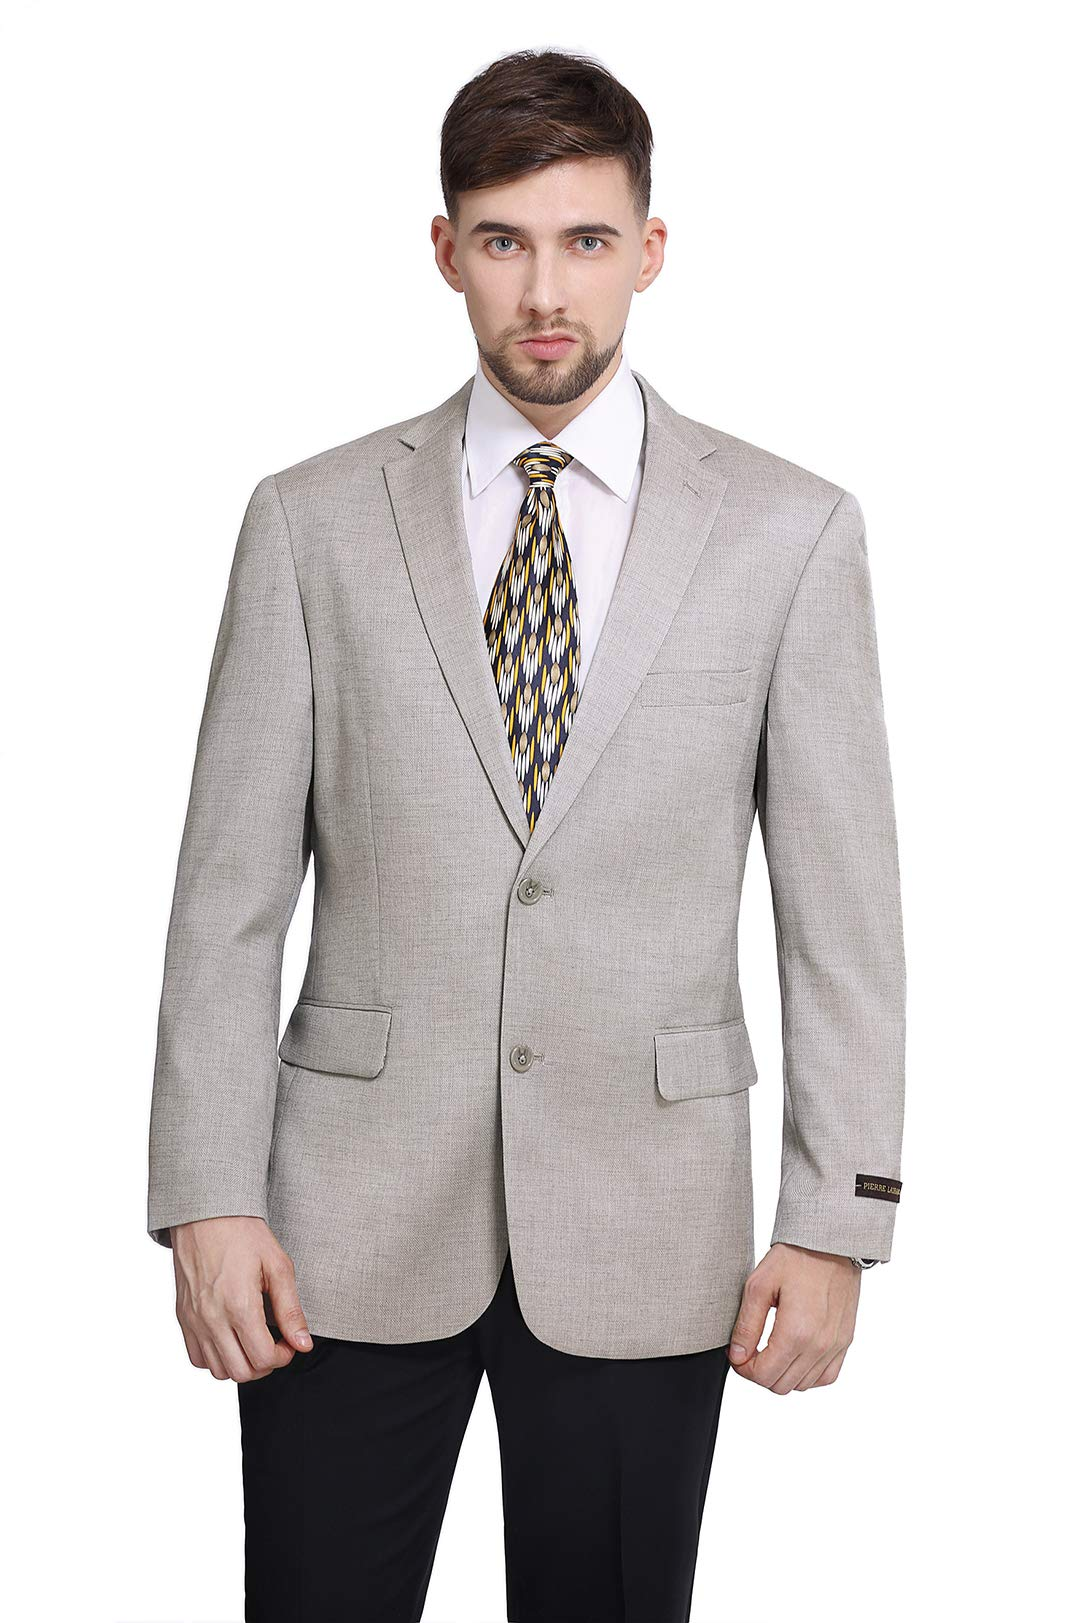 P&L Men's Modern Fit Two-Button Blazer Suit Separate Jacket Dove Gray by P&L